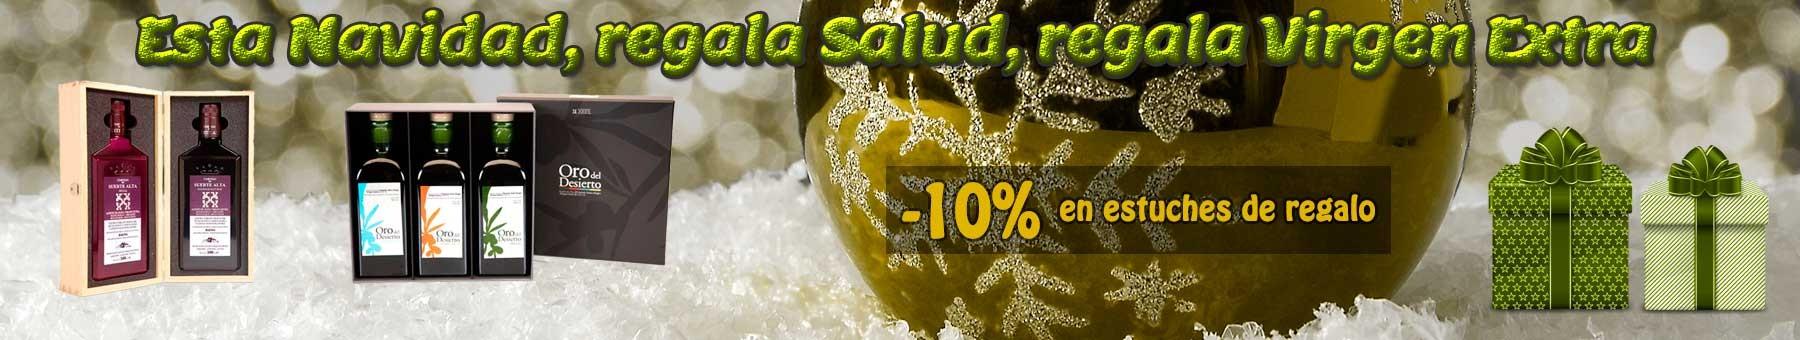 Regalar estuche aceite oliva virgen extra navidad